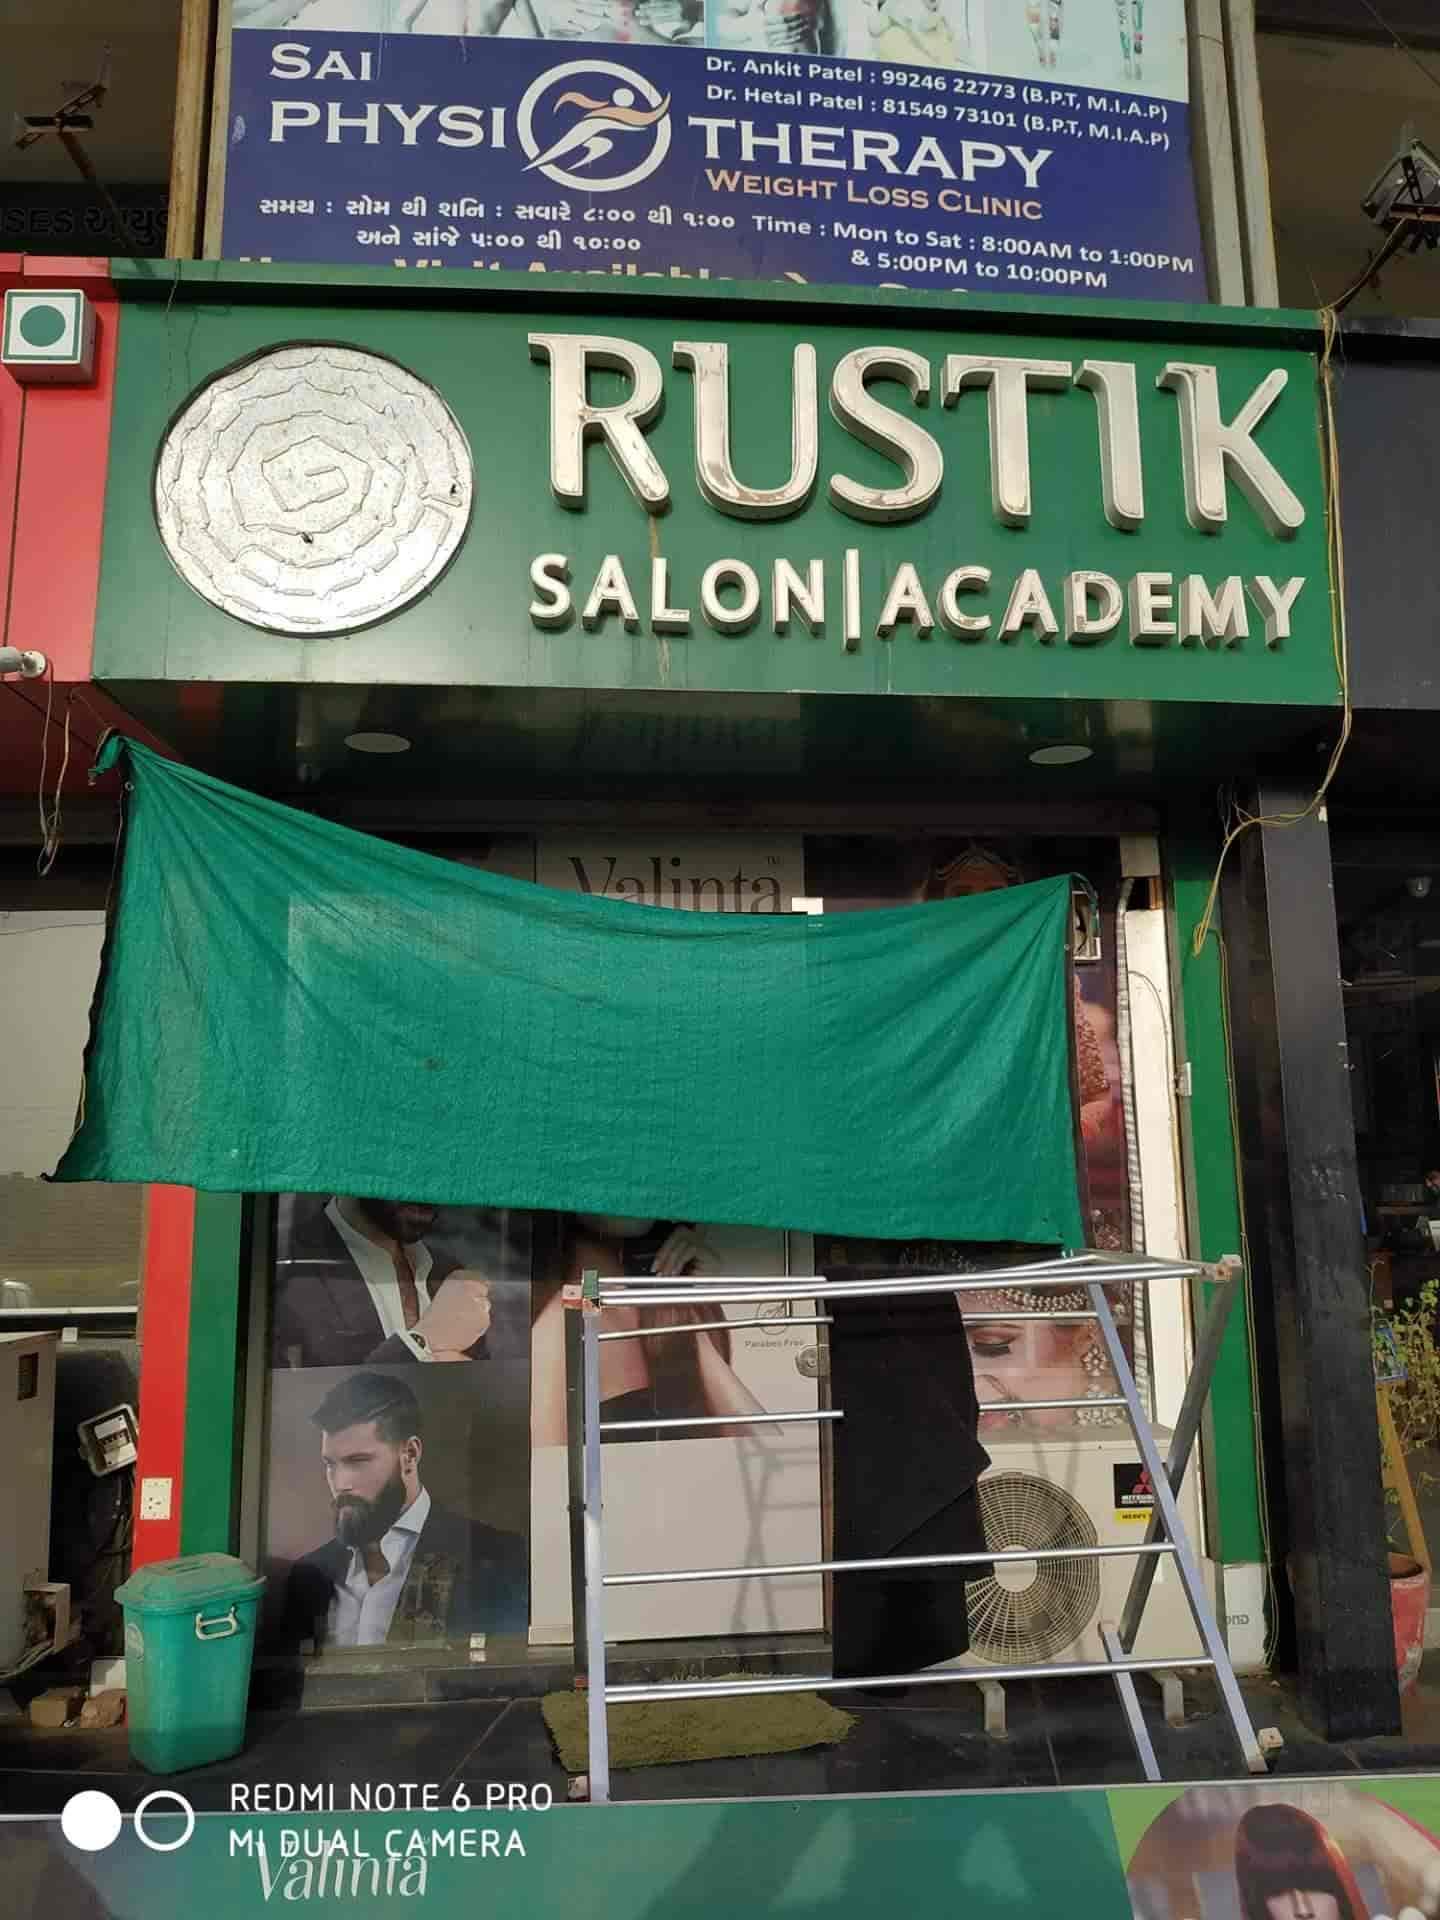 Rustik Unisex Salon & Academy, Gota Road - Beauty Spas in Ahmedabad